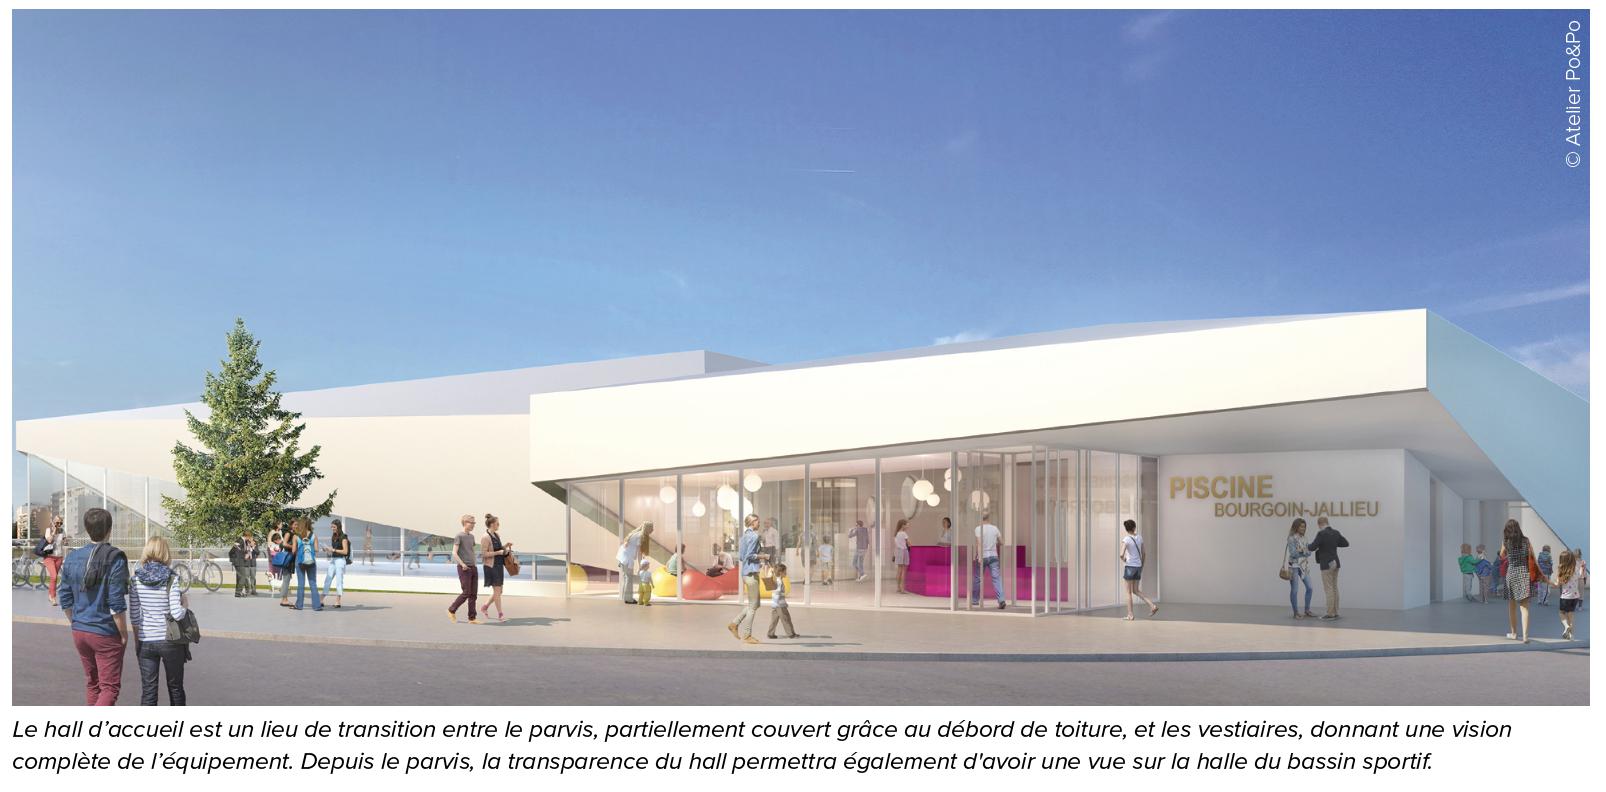 Piscine Champaret À Bourgoin-Jallieu : Une Piscine ... tout Piscine Bourgoin Jallieu